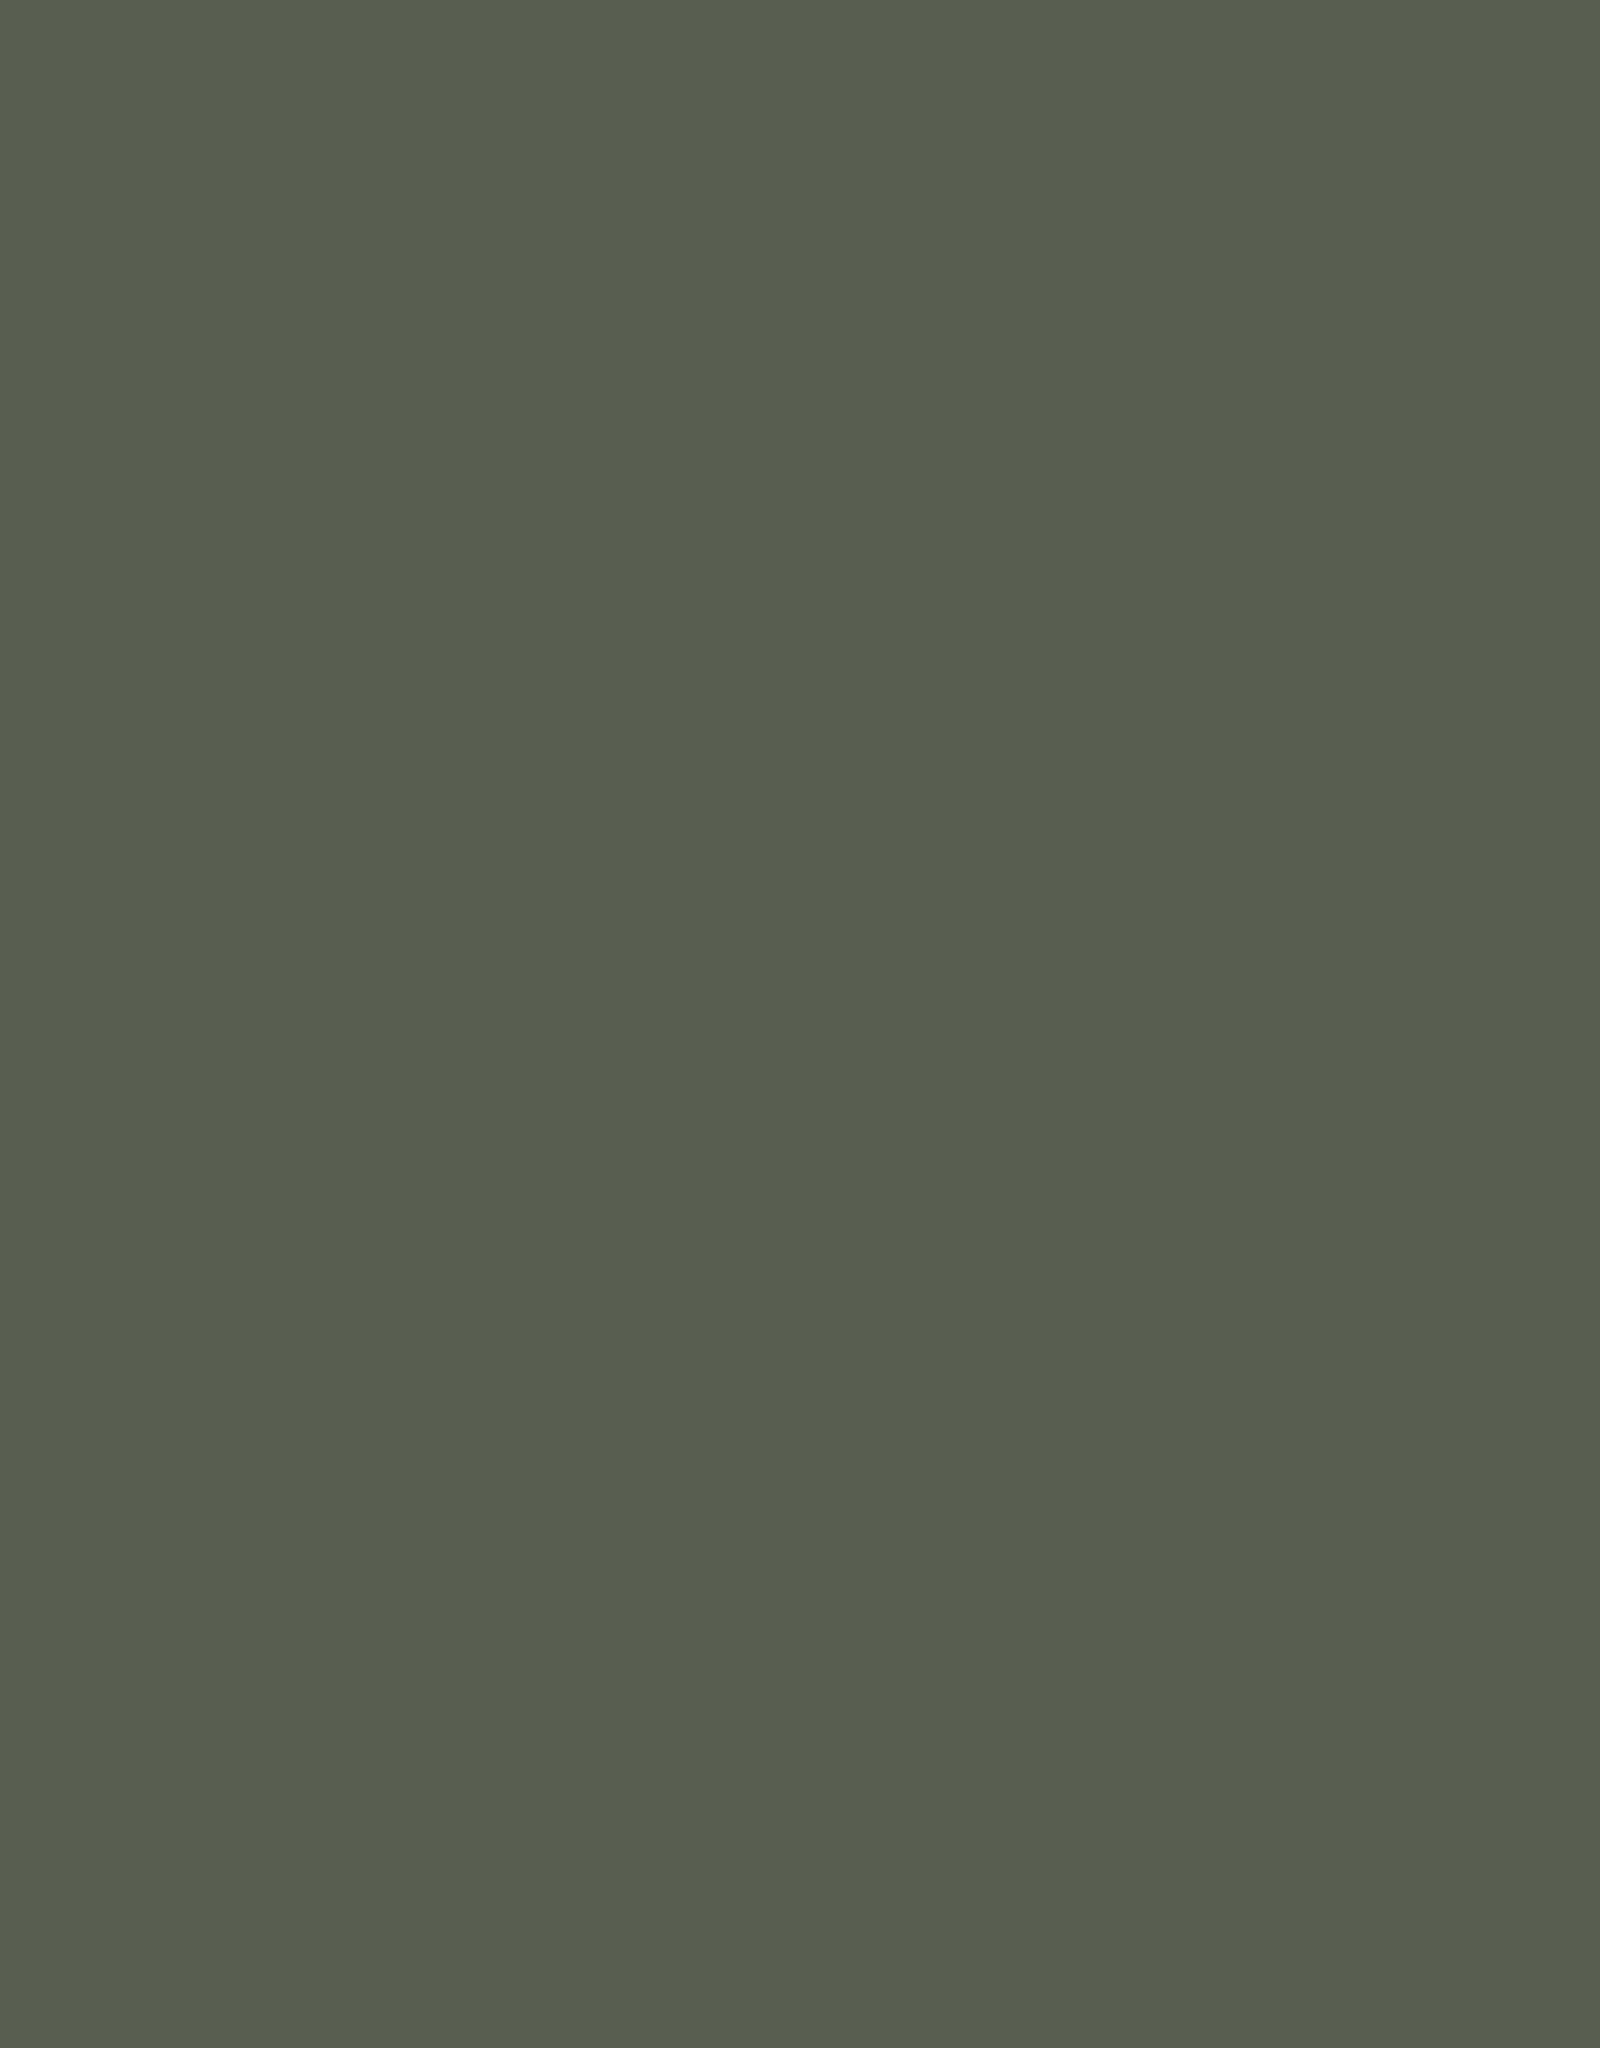 Sennelier, Extra Fine Soft Pastel, Reseda Gray Green